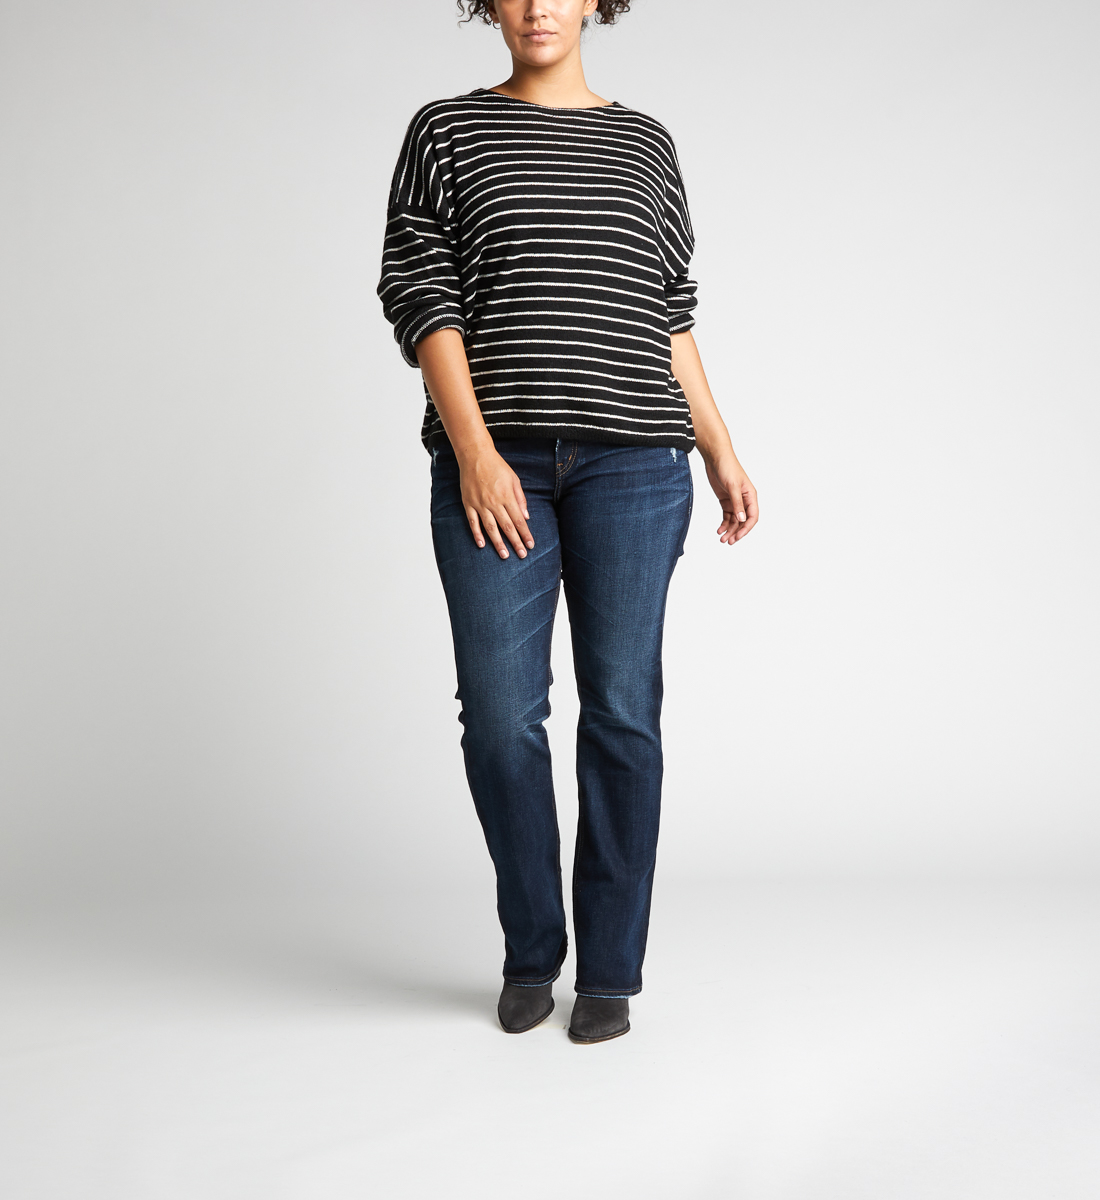 7d84fe187a2 Elyse Mid Rise Slim Bootcut Jeans Plus Size